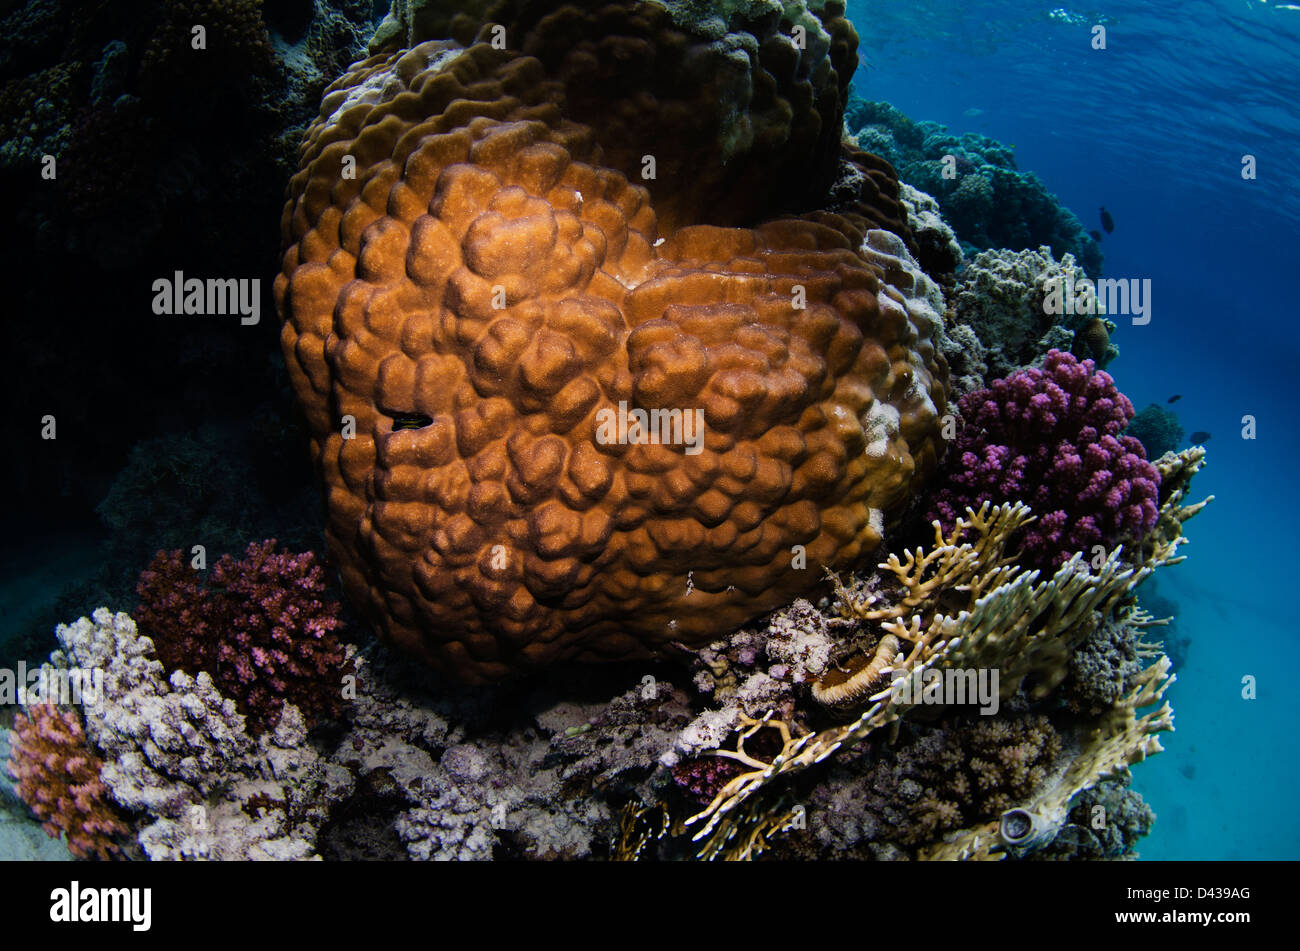 A heart shaped Favia coral. - Stock Image